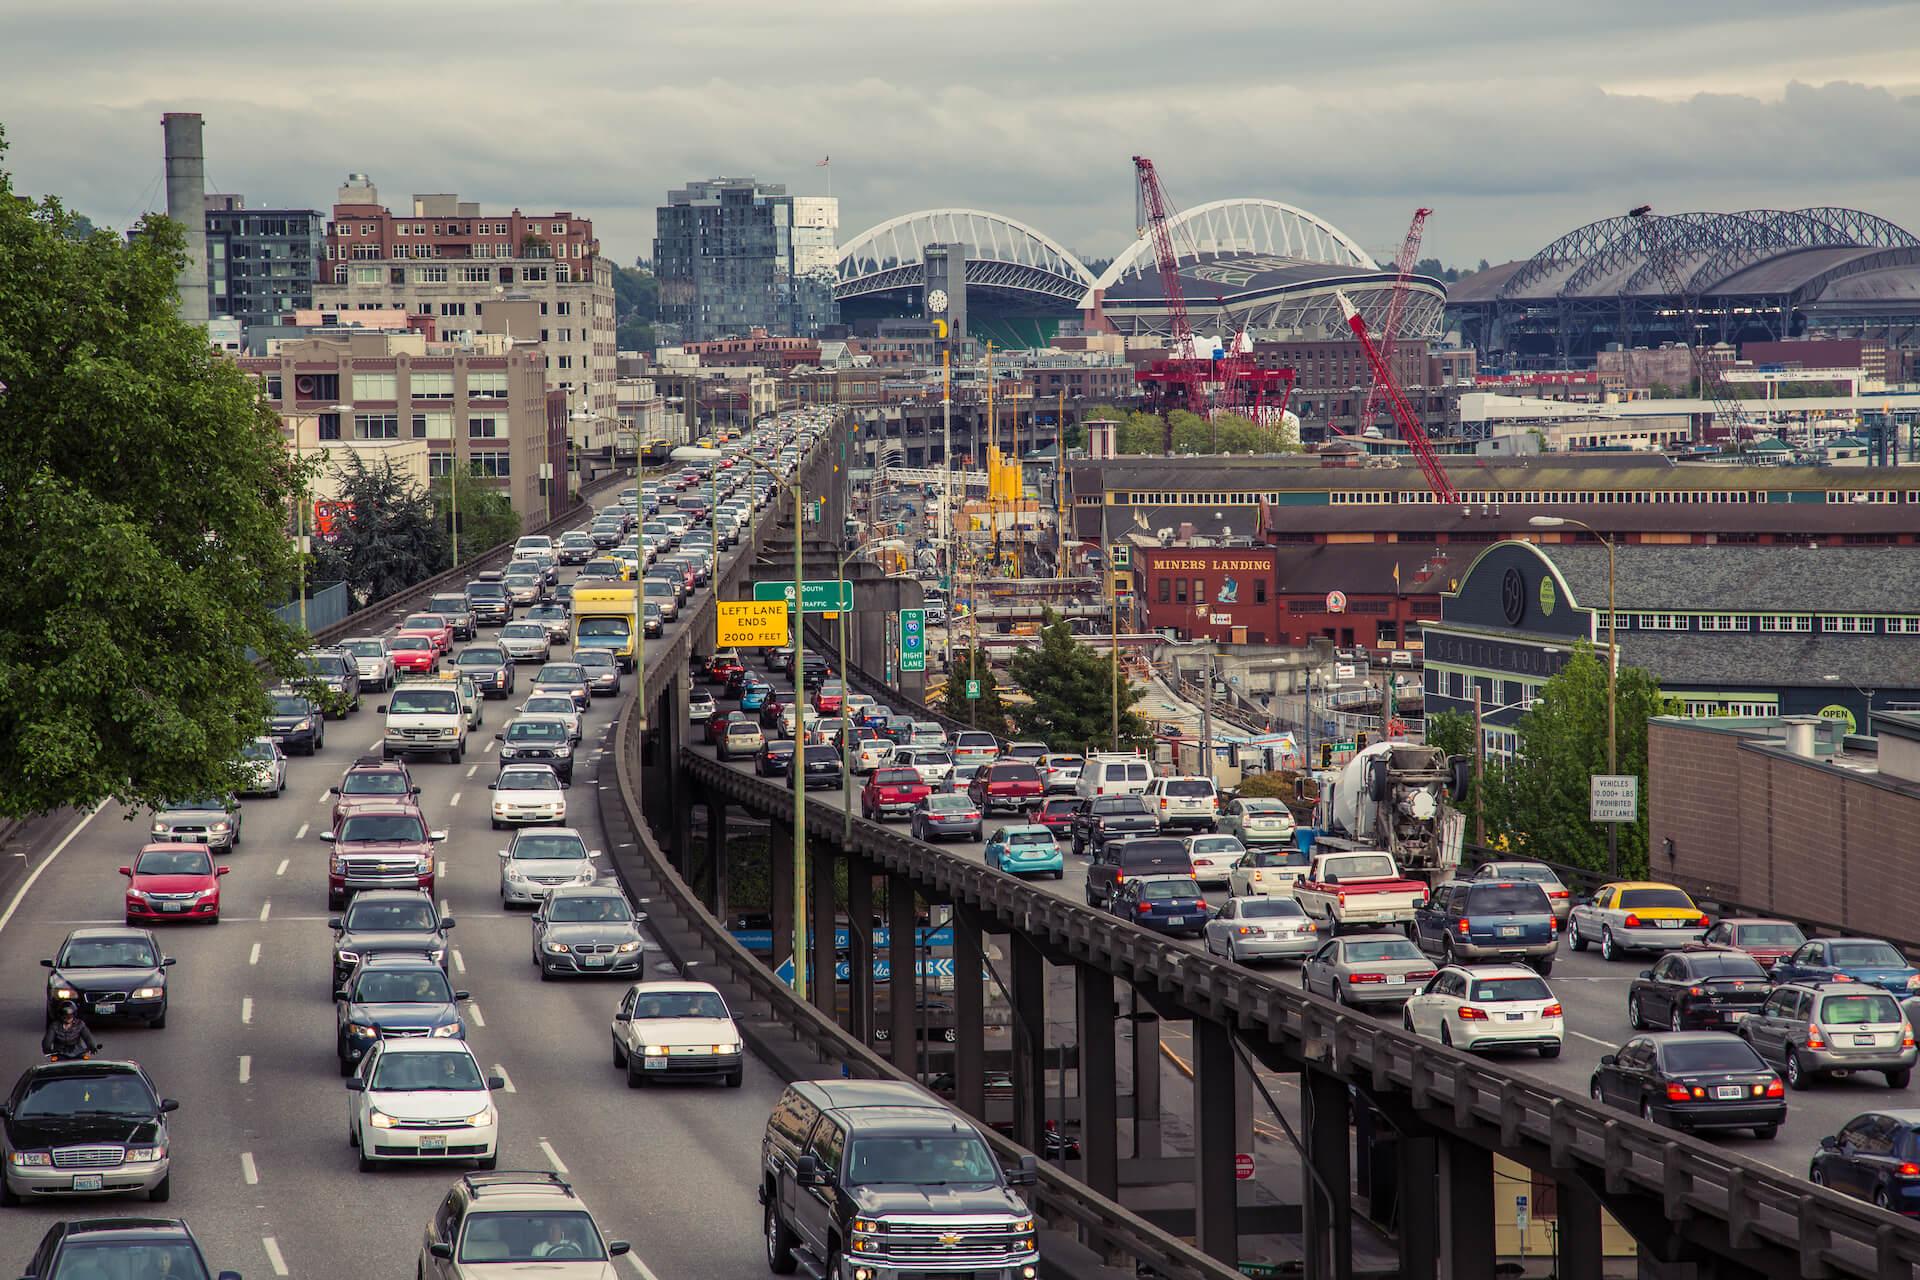 Alaskan Way Viaduct Traffic Seattle, Washington